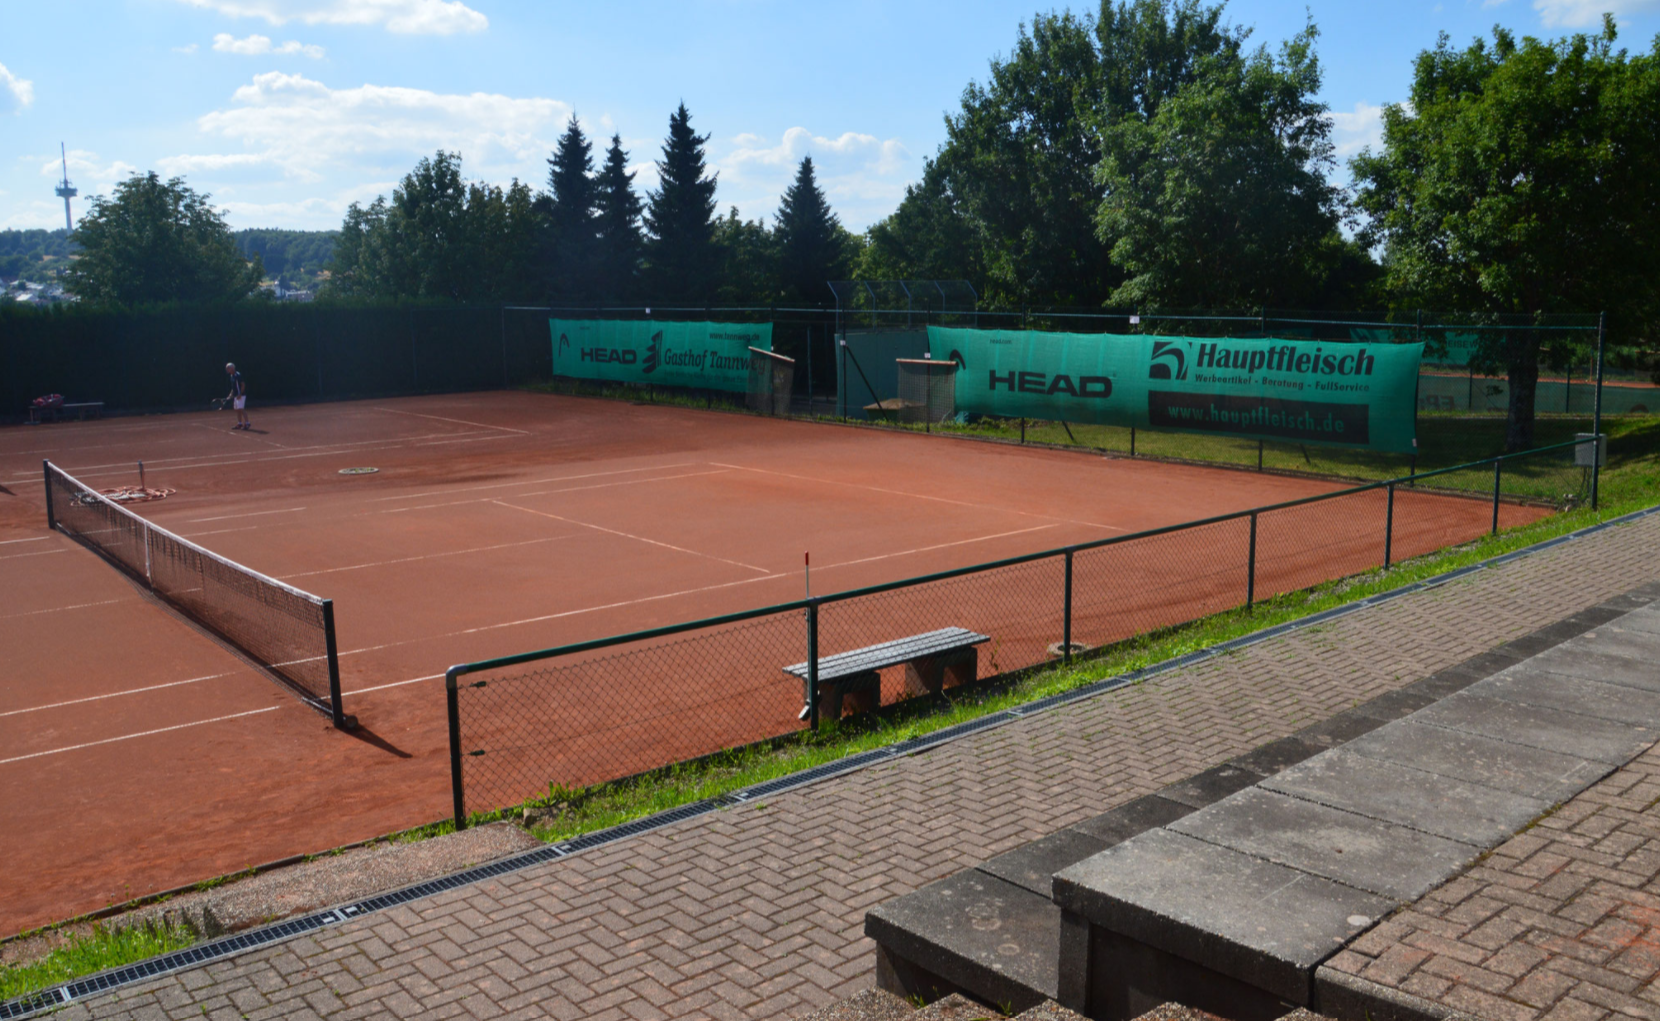 Aktuelles aus unserer Tennisabteilung